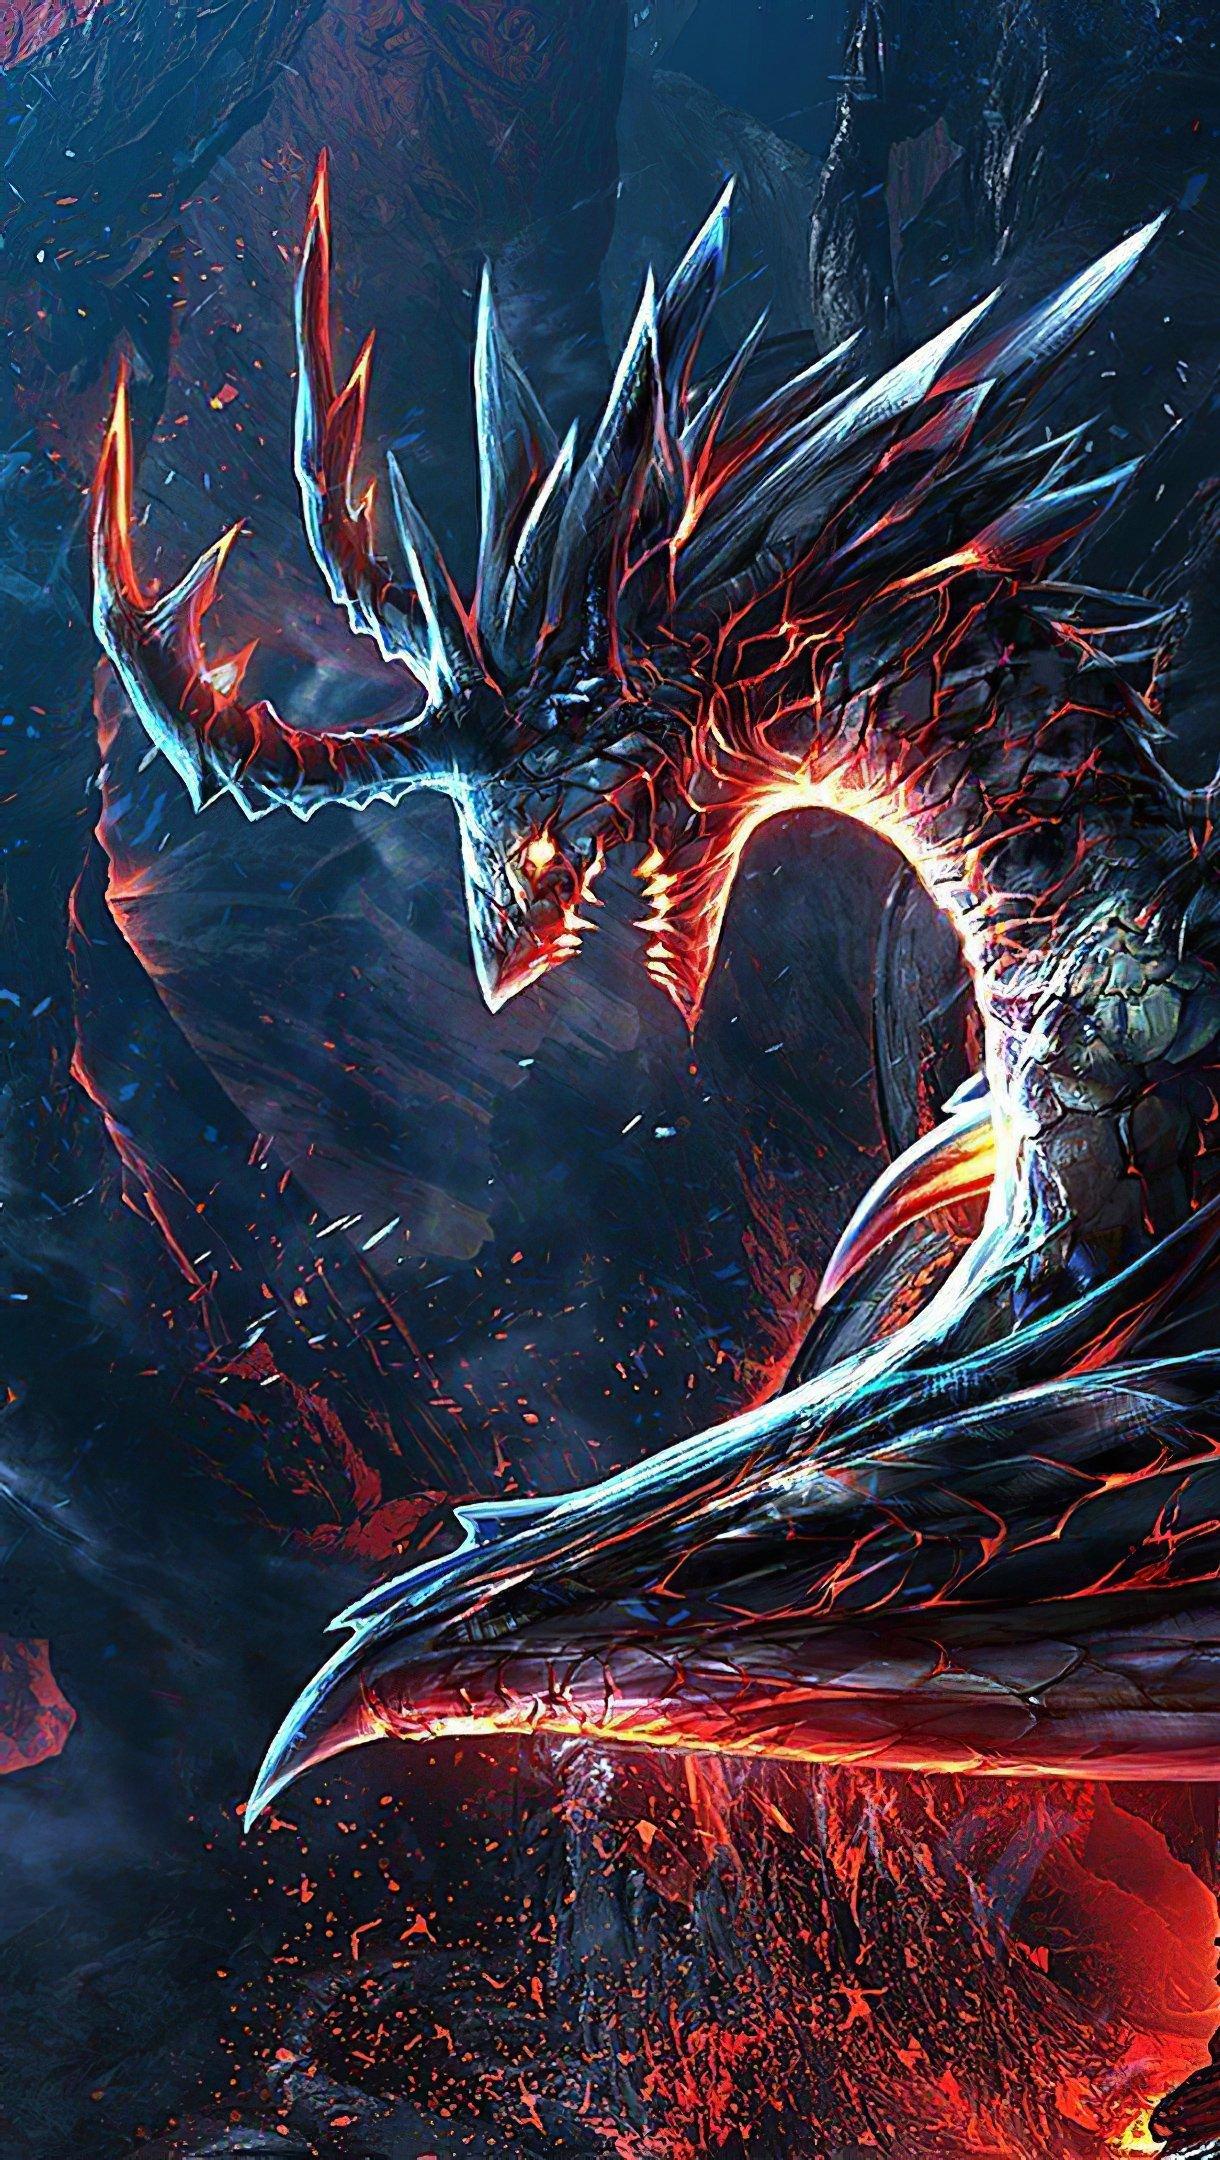 Fondos de pantalla Dragon en llamas Vertical